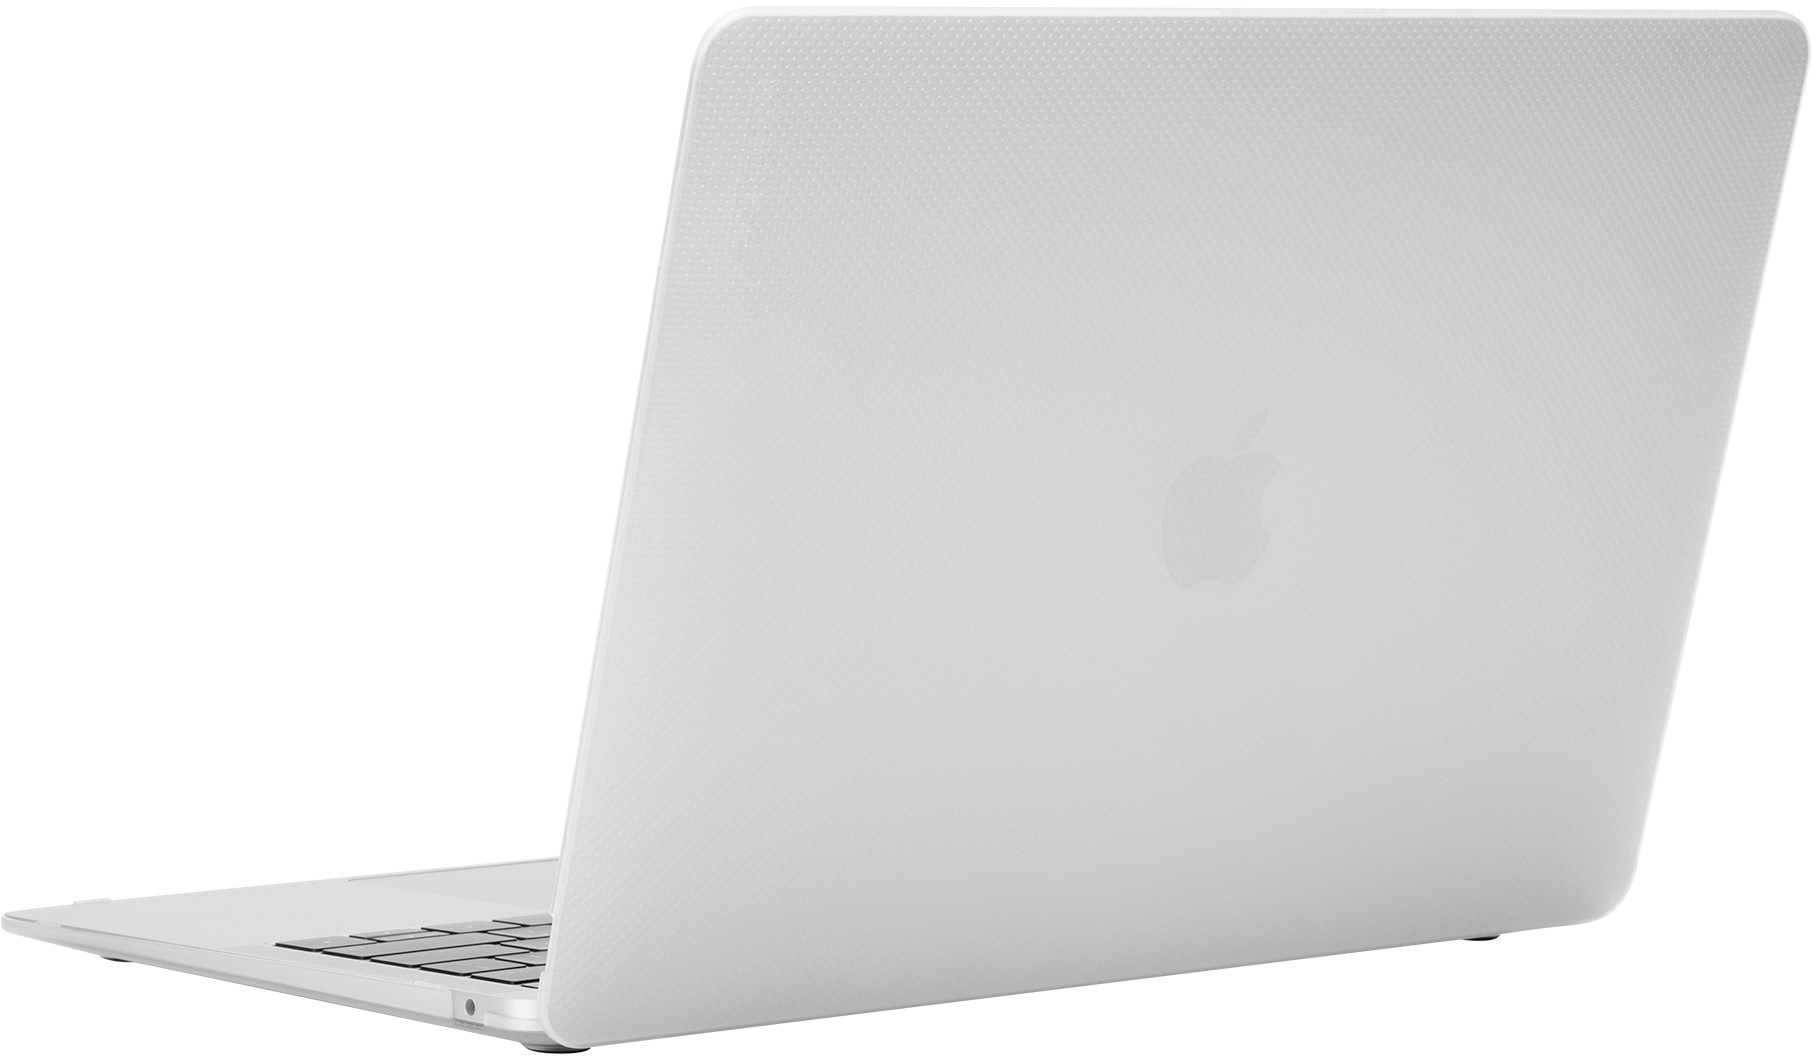 Чехол Incase Hardshell (INMB200617-CLR) для MacBook Air 13